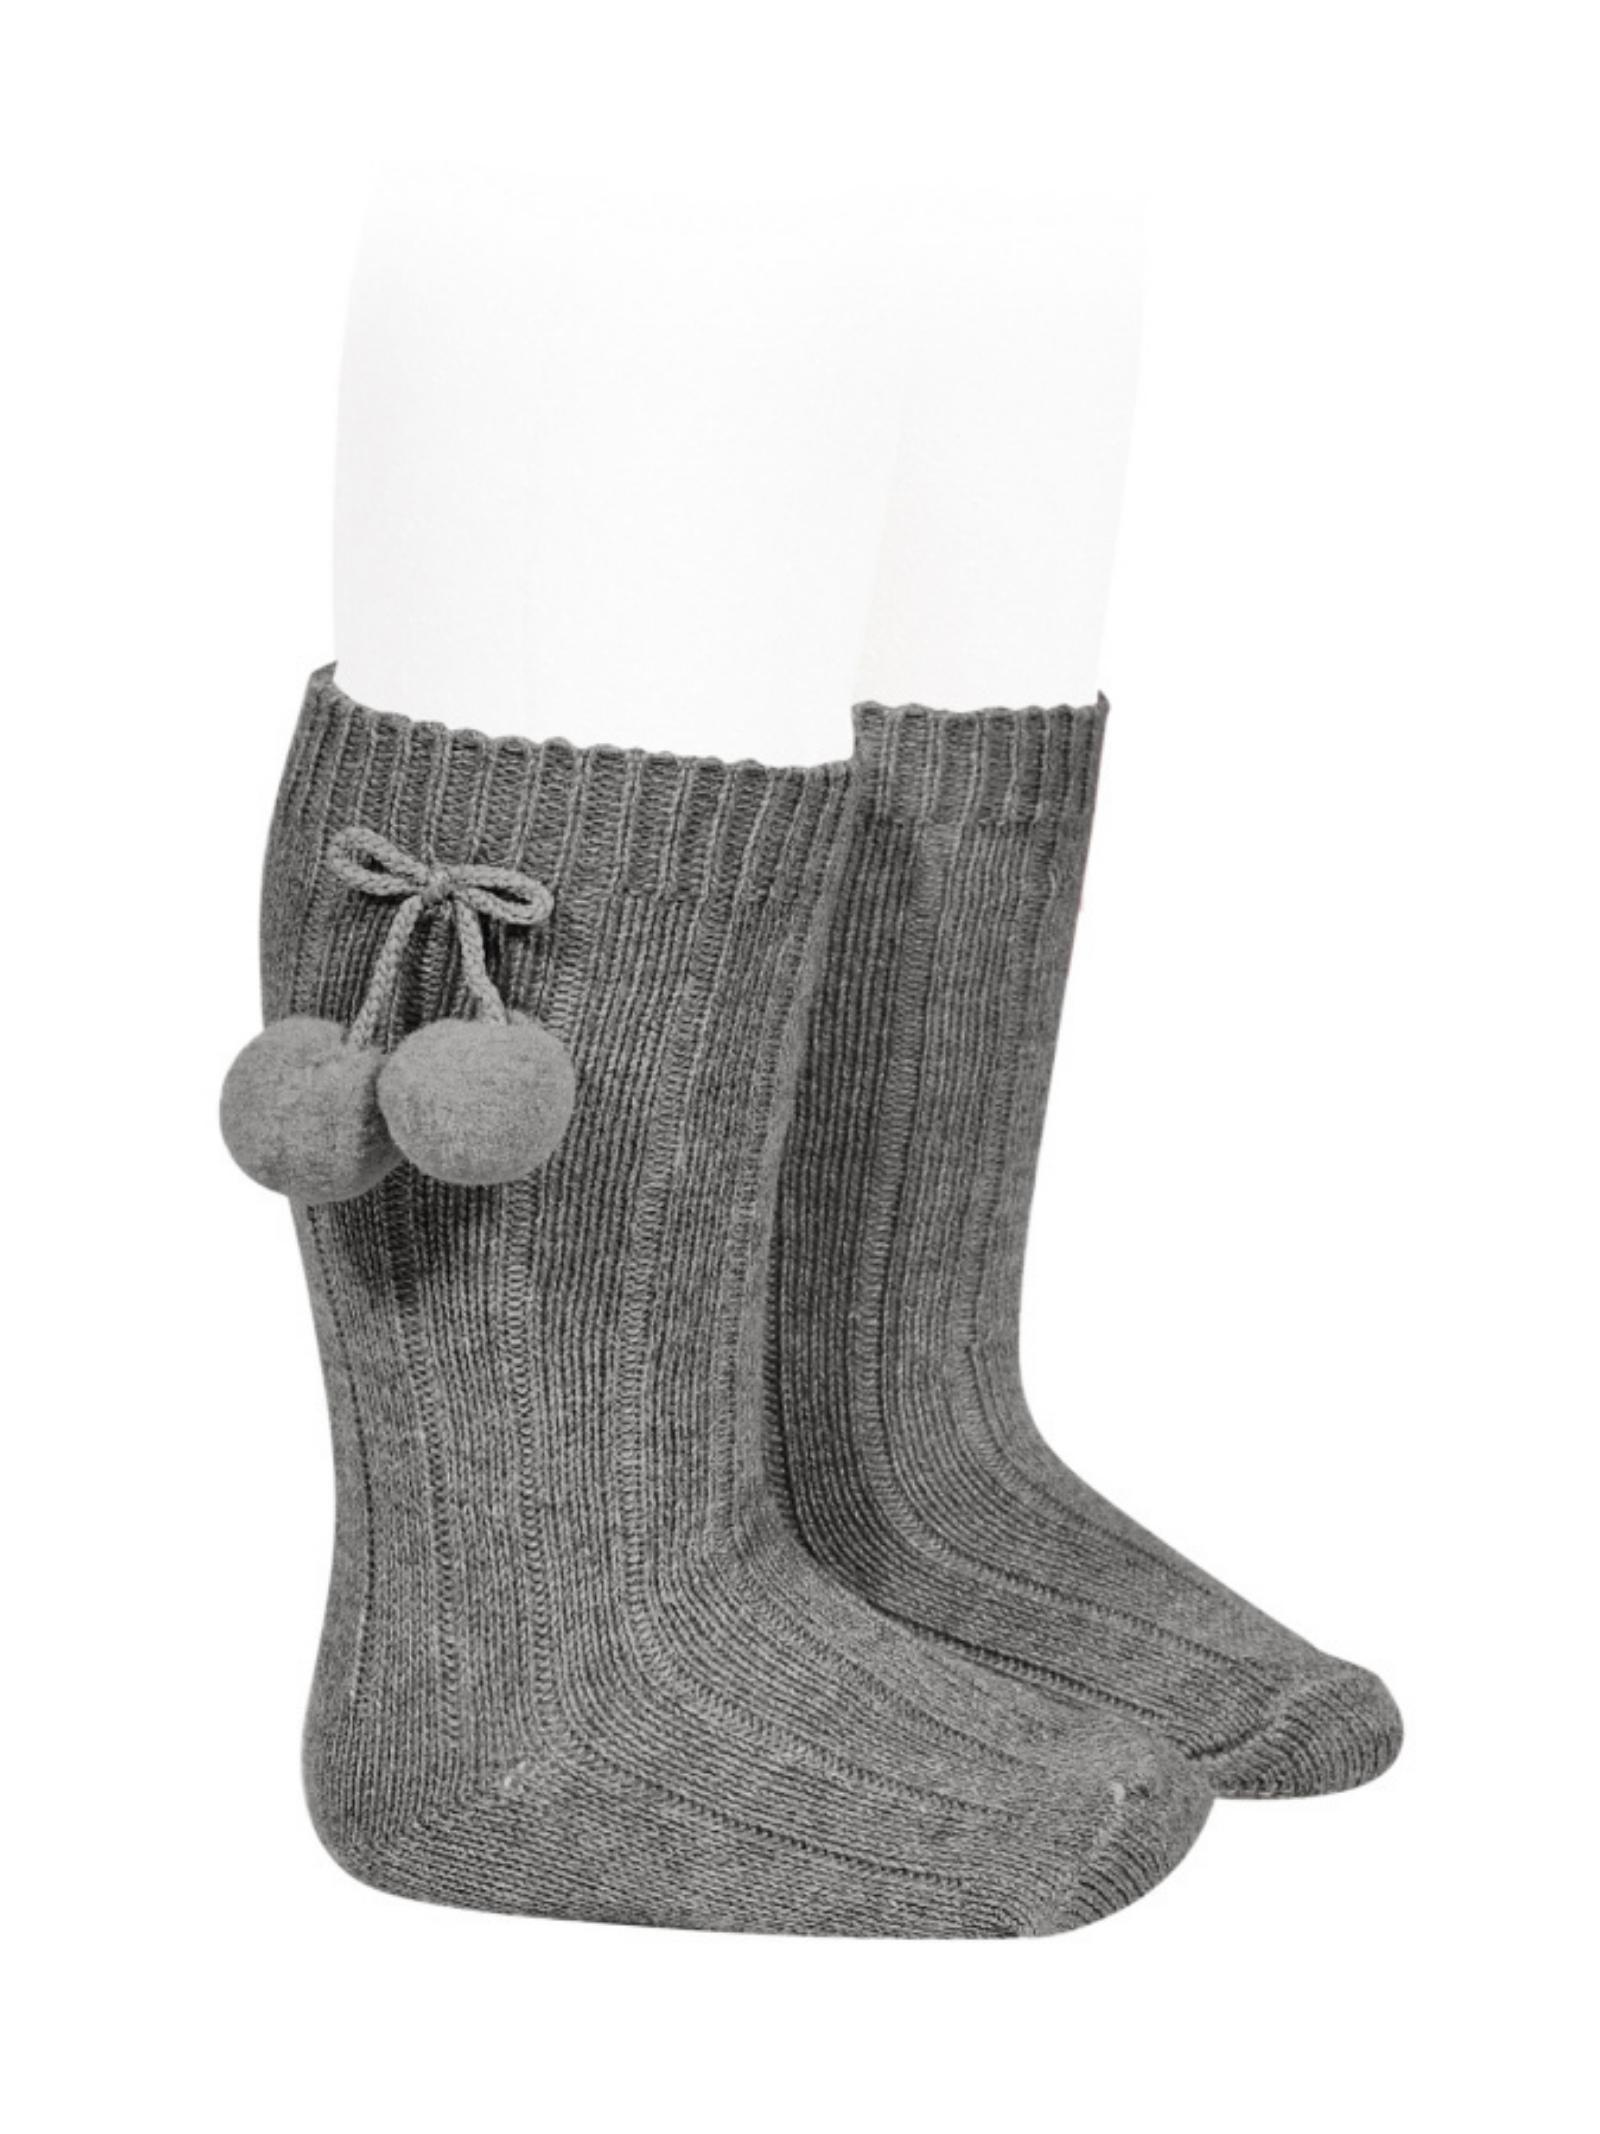 Ribbed Pompon Socks for Girls CONDOR | Socks | 30152230